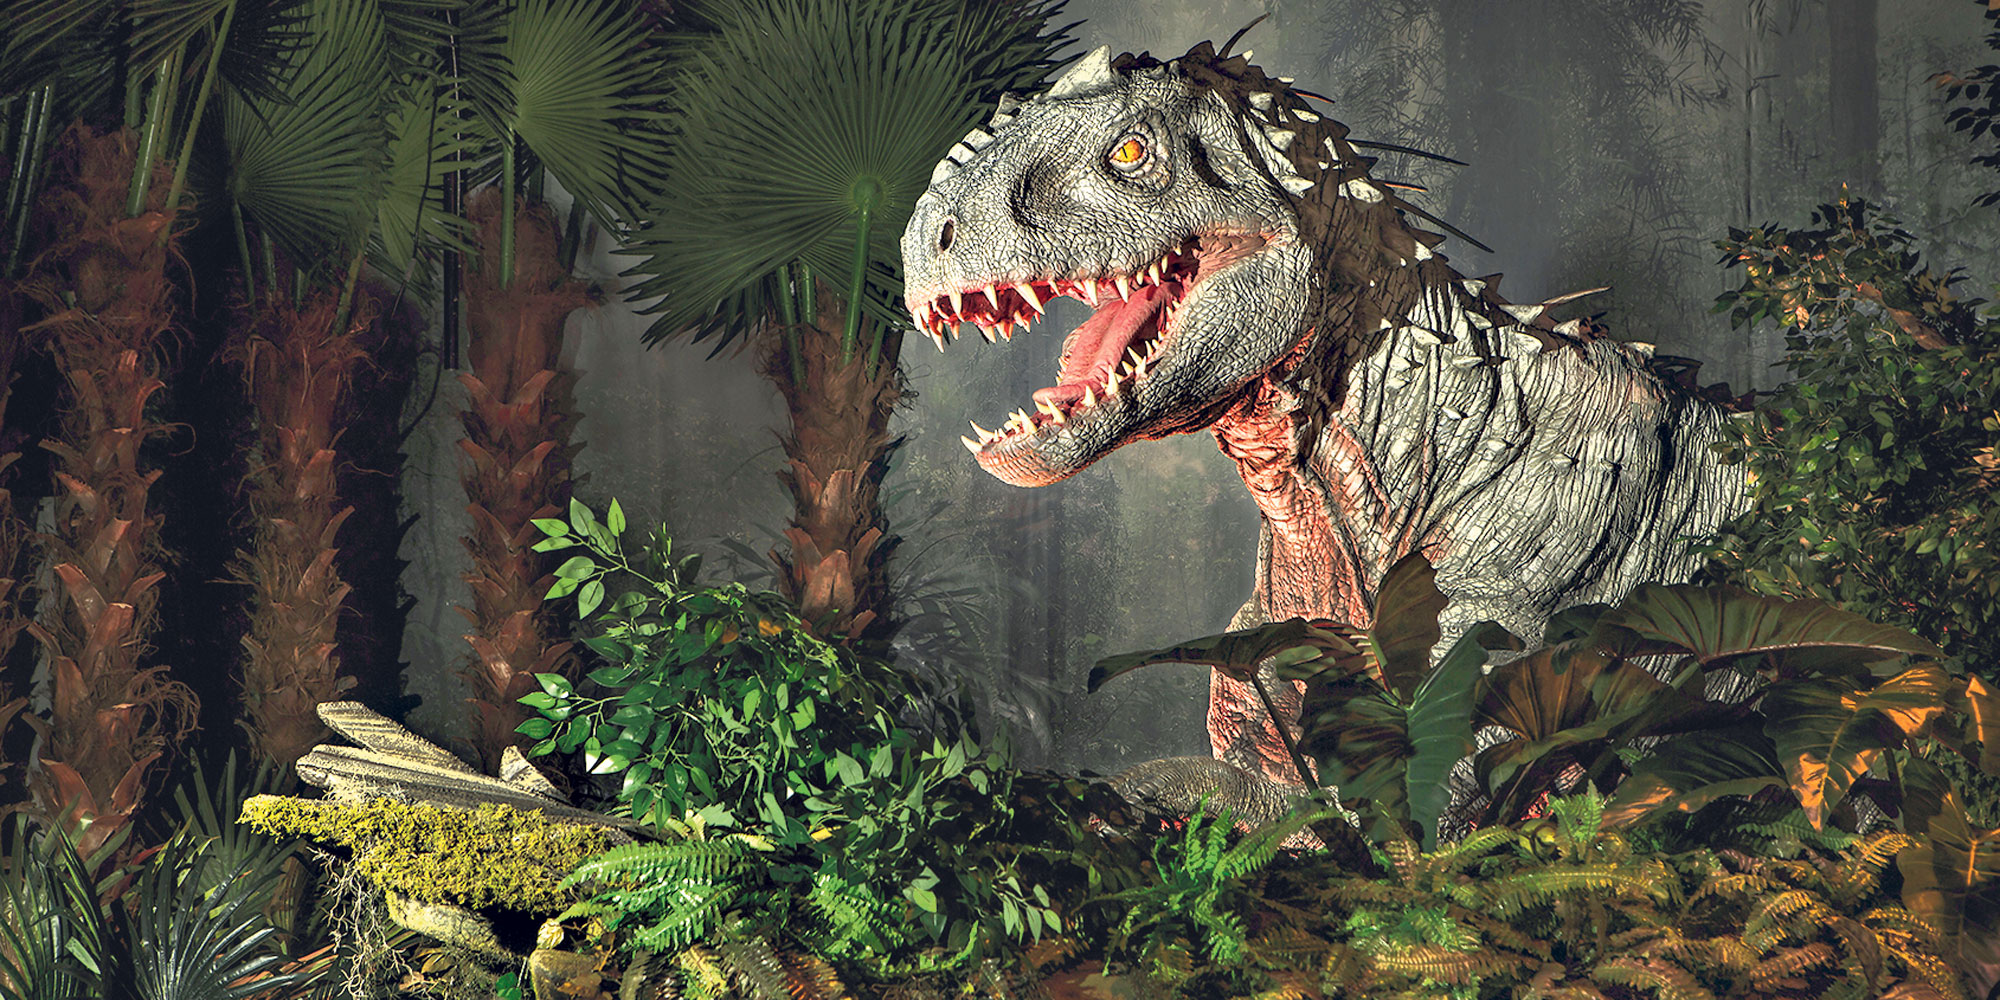 Les dinosaures de jurassic world grandeur nature au mus e - Dinosaure de jurassic park ...